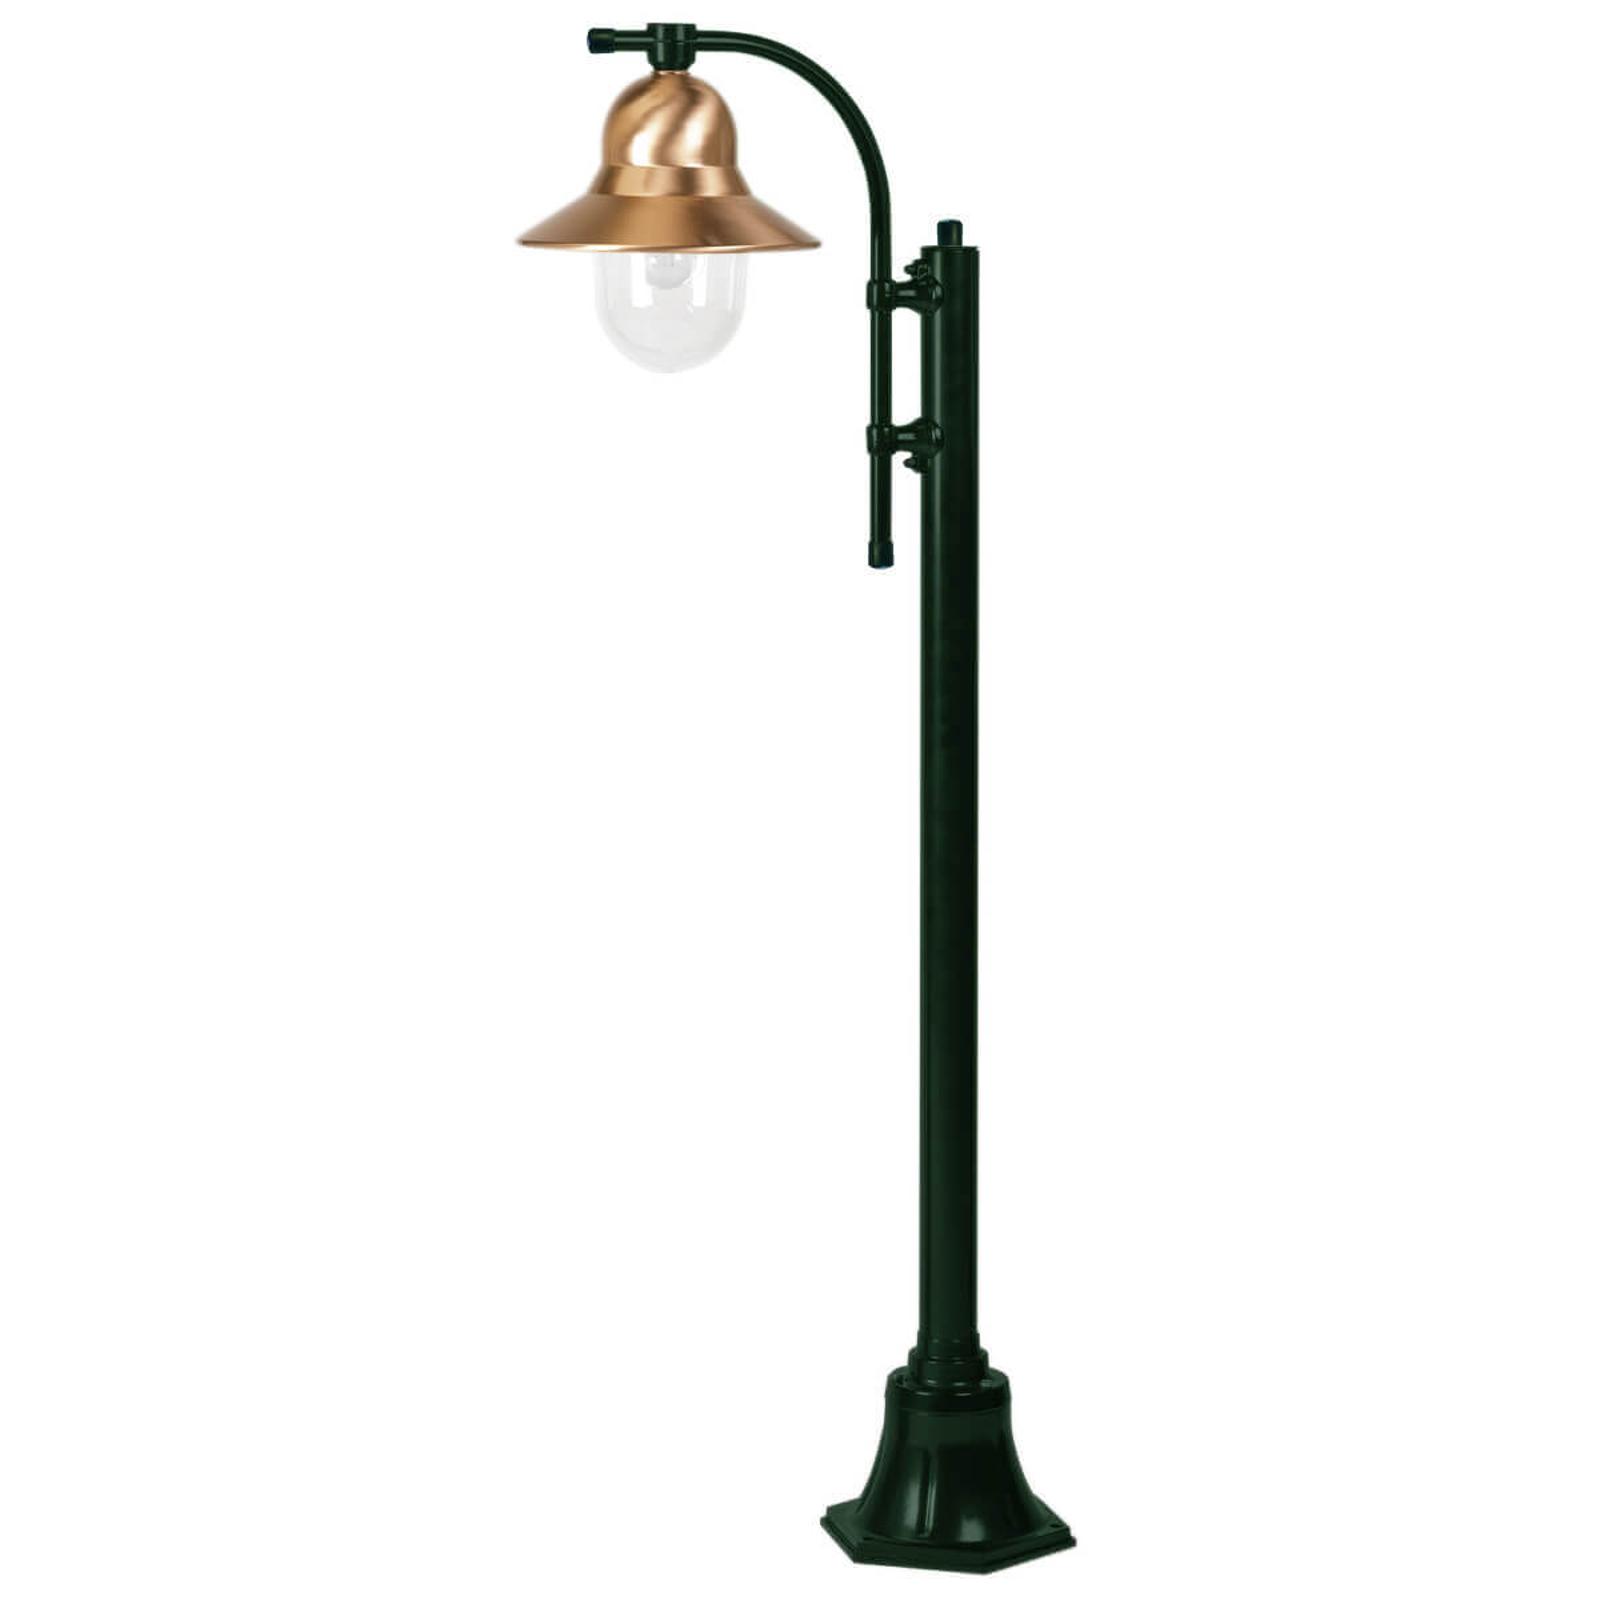 Lampadaire Toscane à 1 lampe 150 cm vert